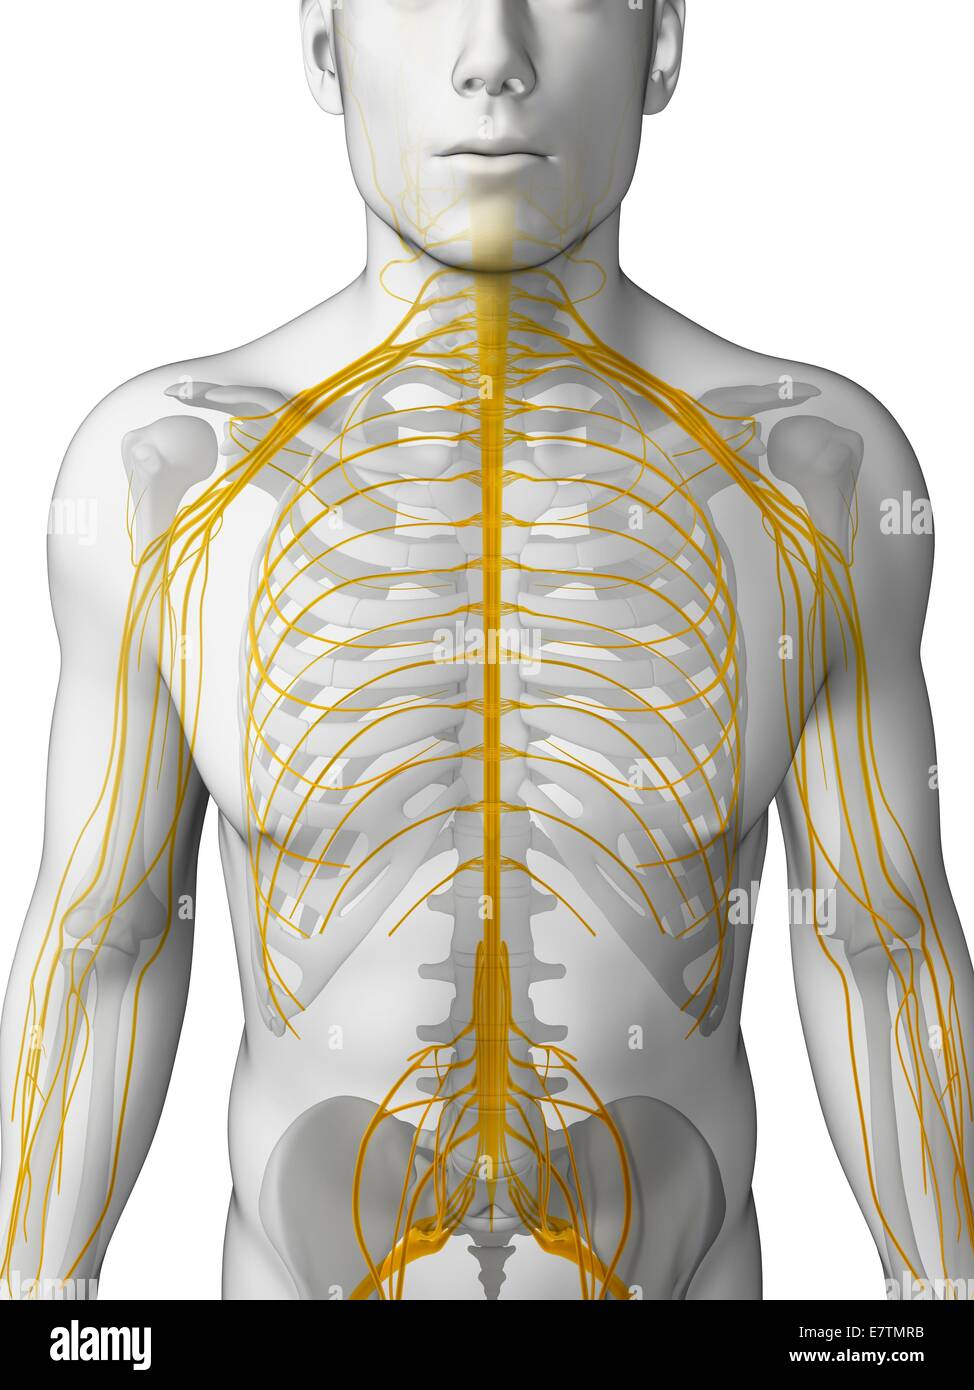 Menschlichen Nervensystem, Computer-Grafik Stockfoto, Bild: 73687247 ...